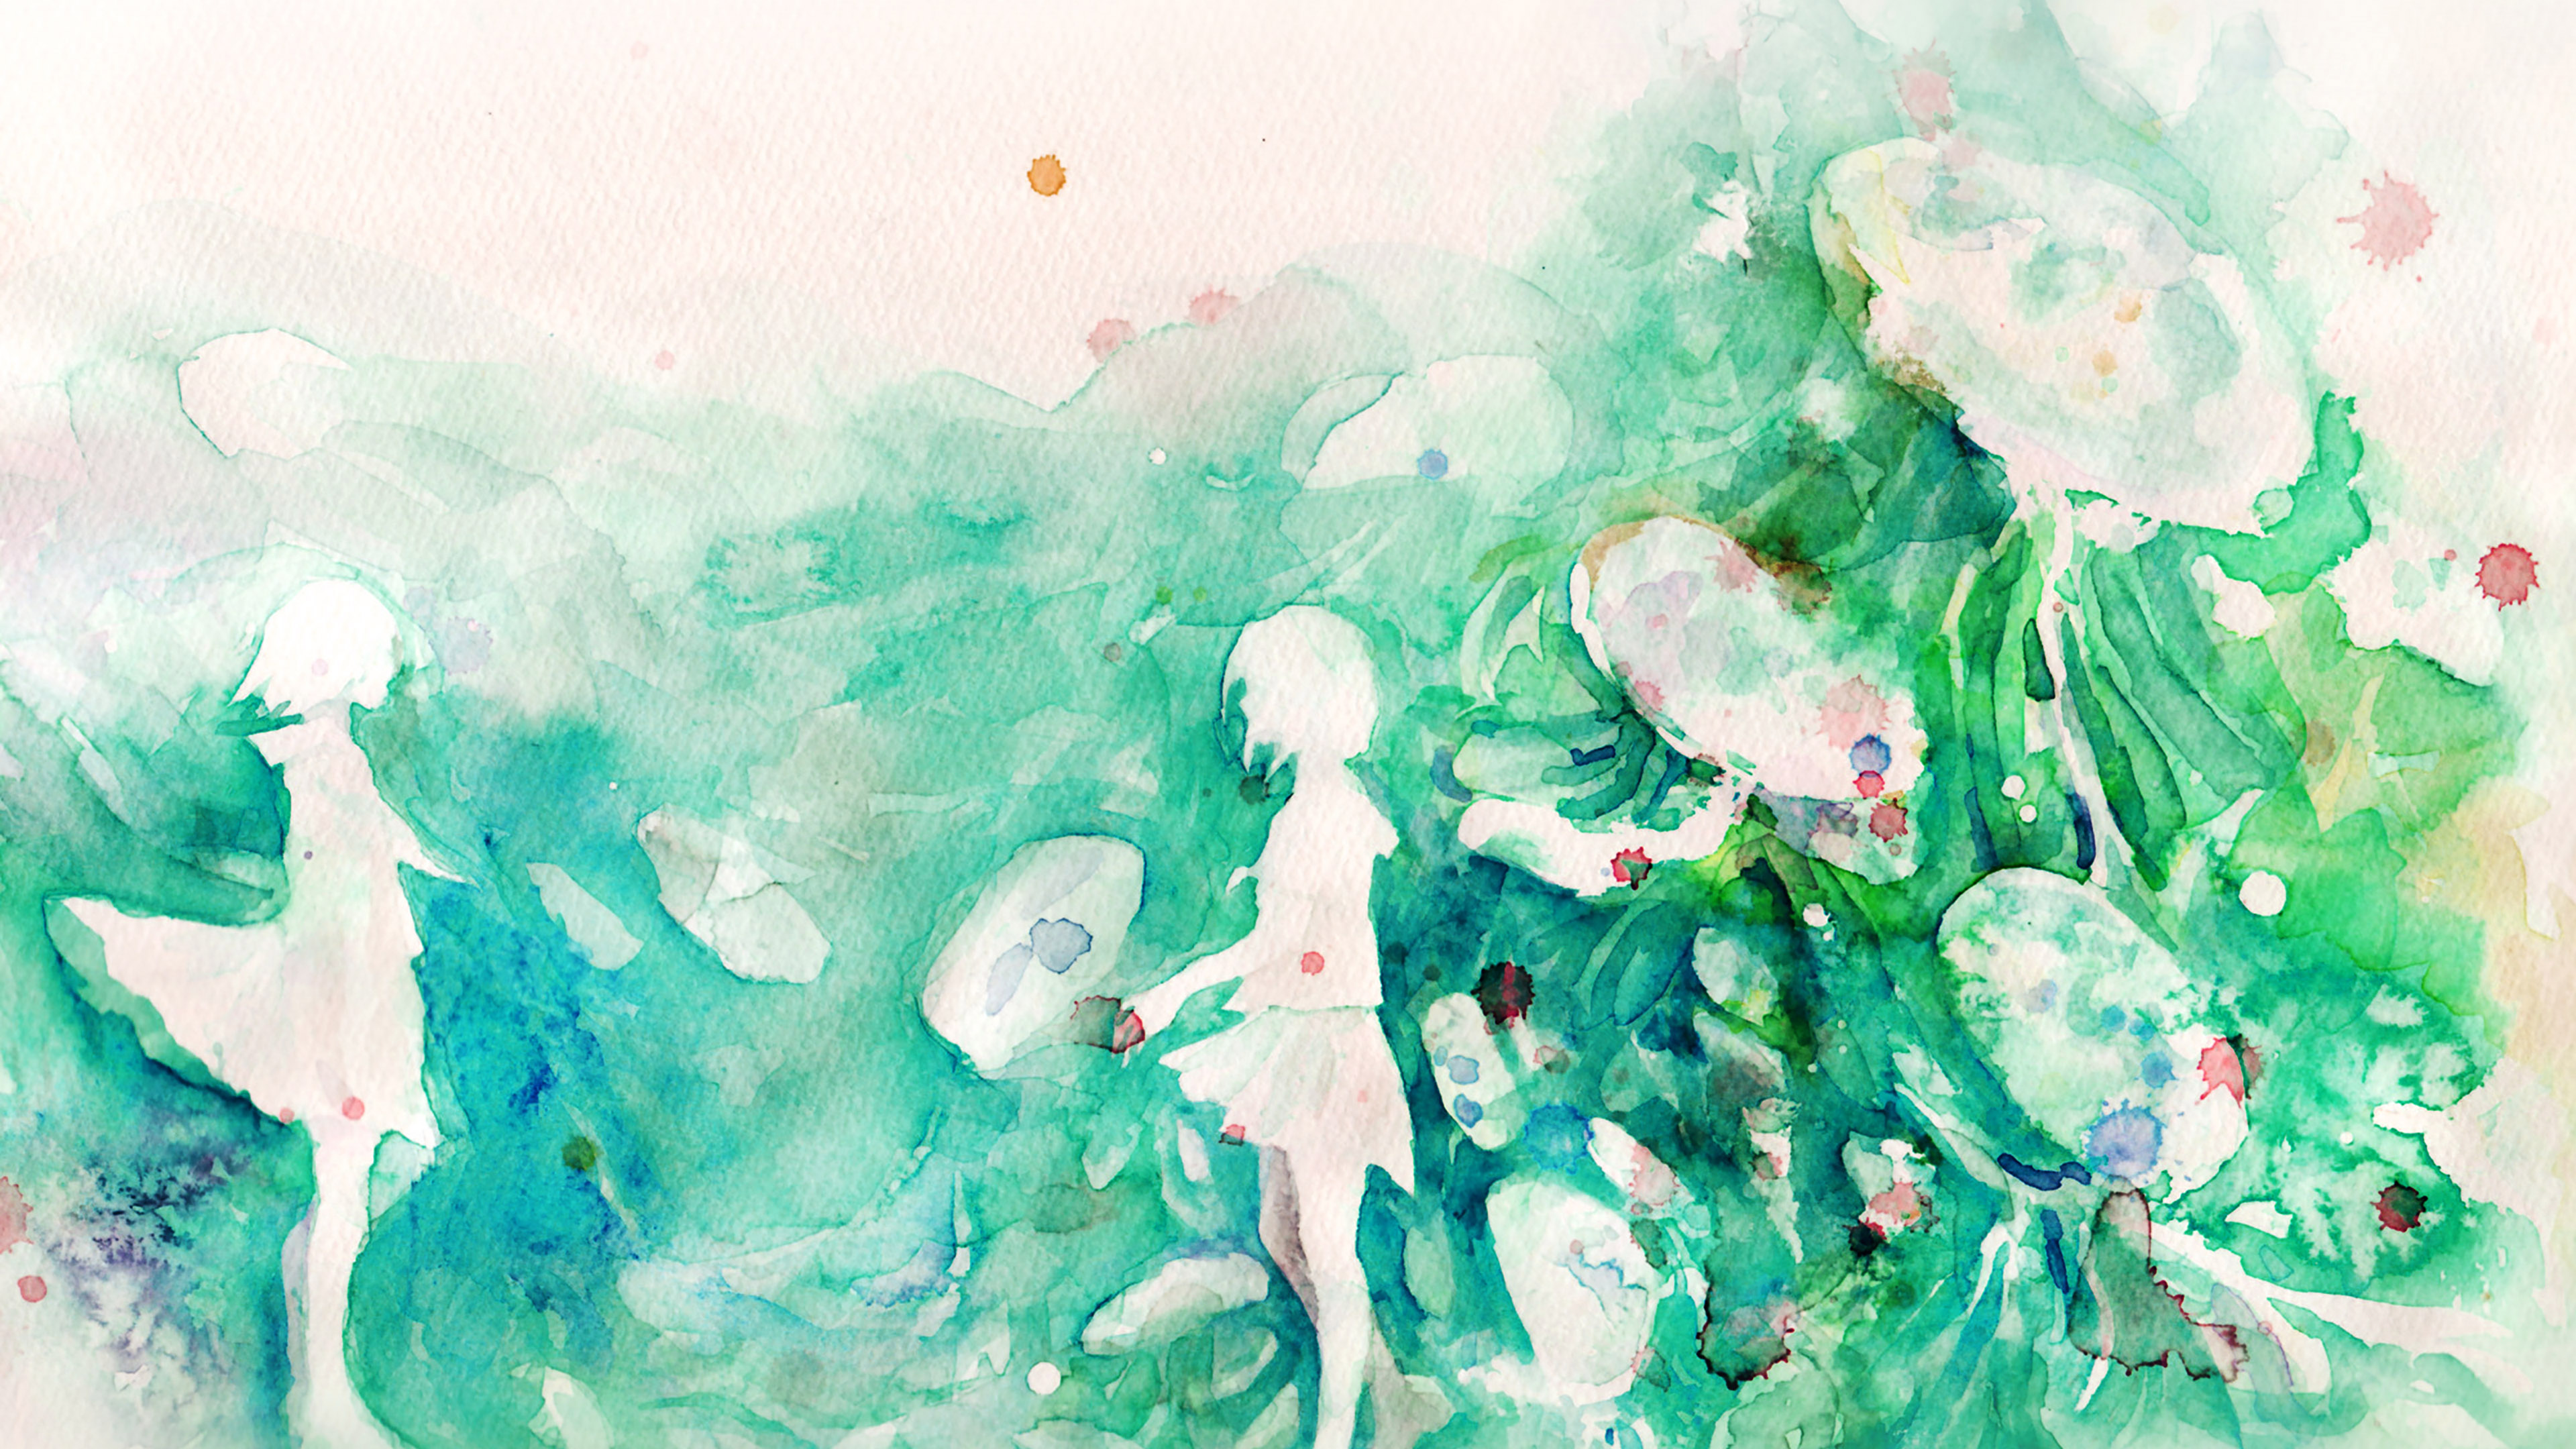 Free Fall Disney Wallpaper Ai07 Watercolor Green Girl Nature Art Illust Wallpaper